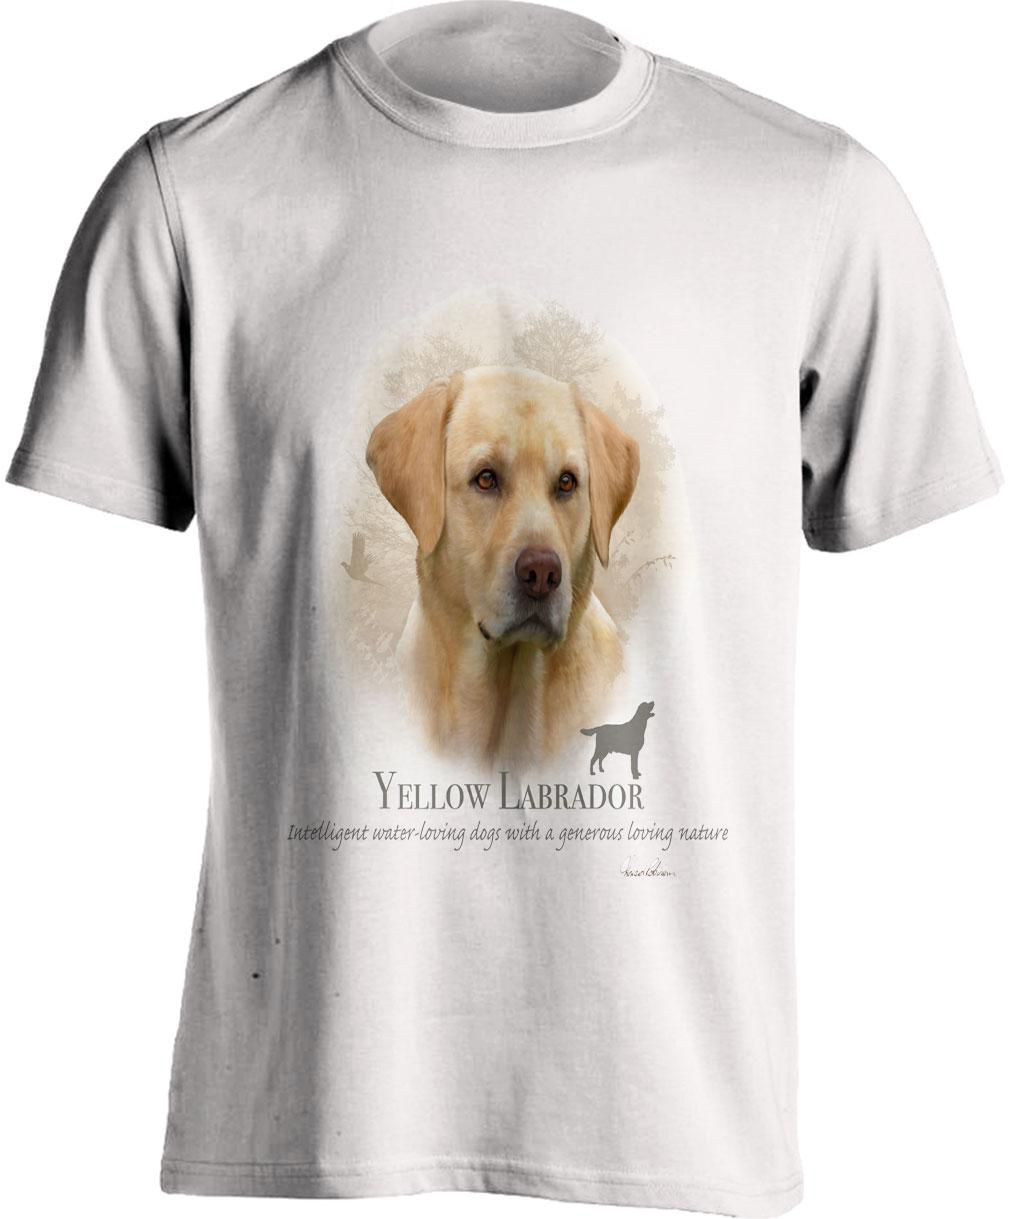 Yellow Labrador T Shirt